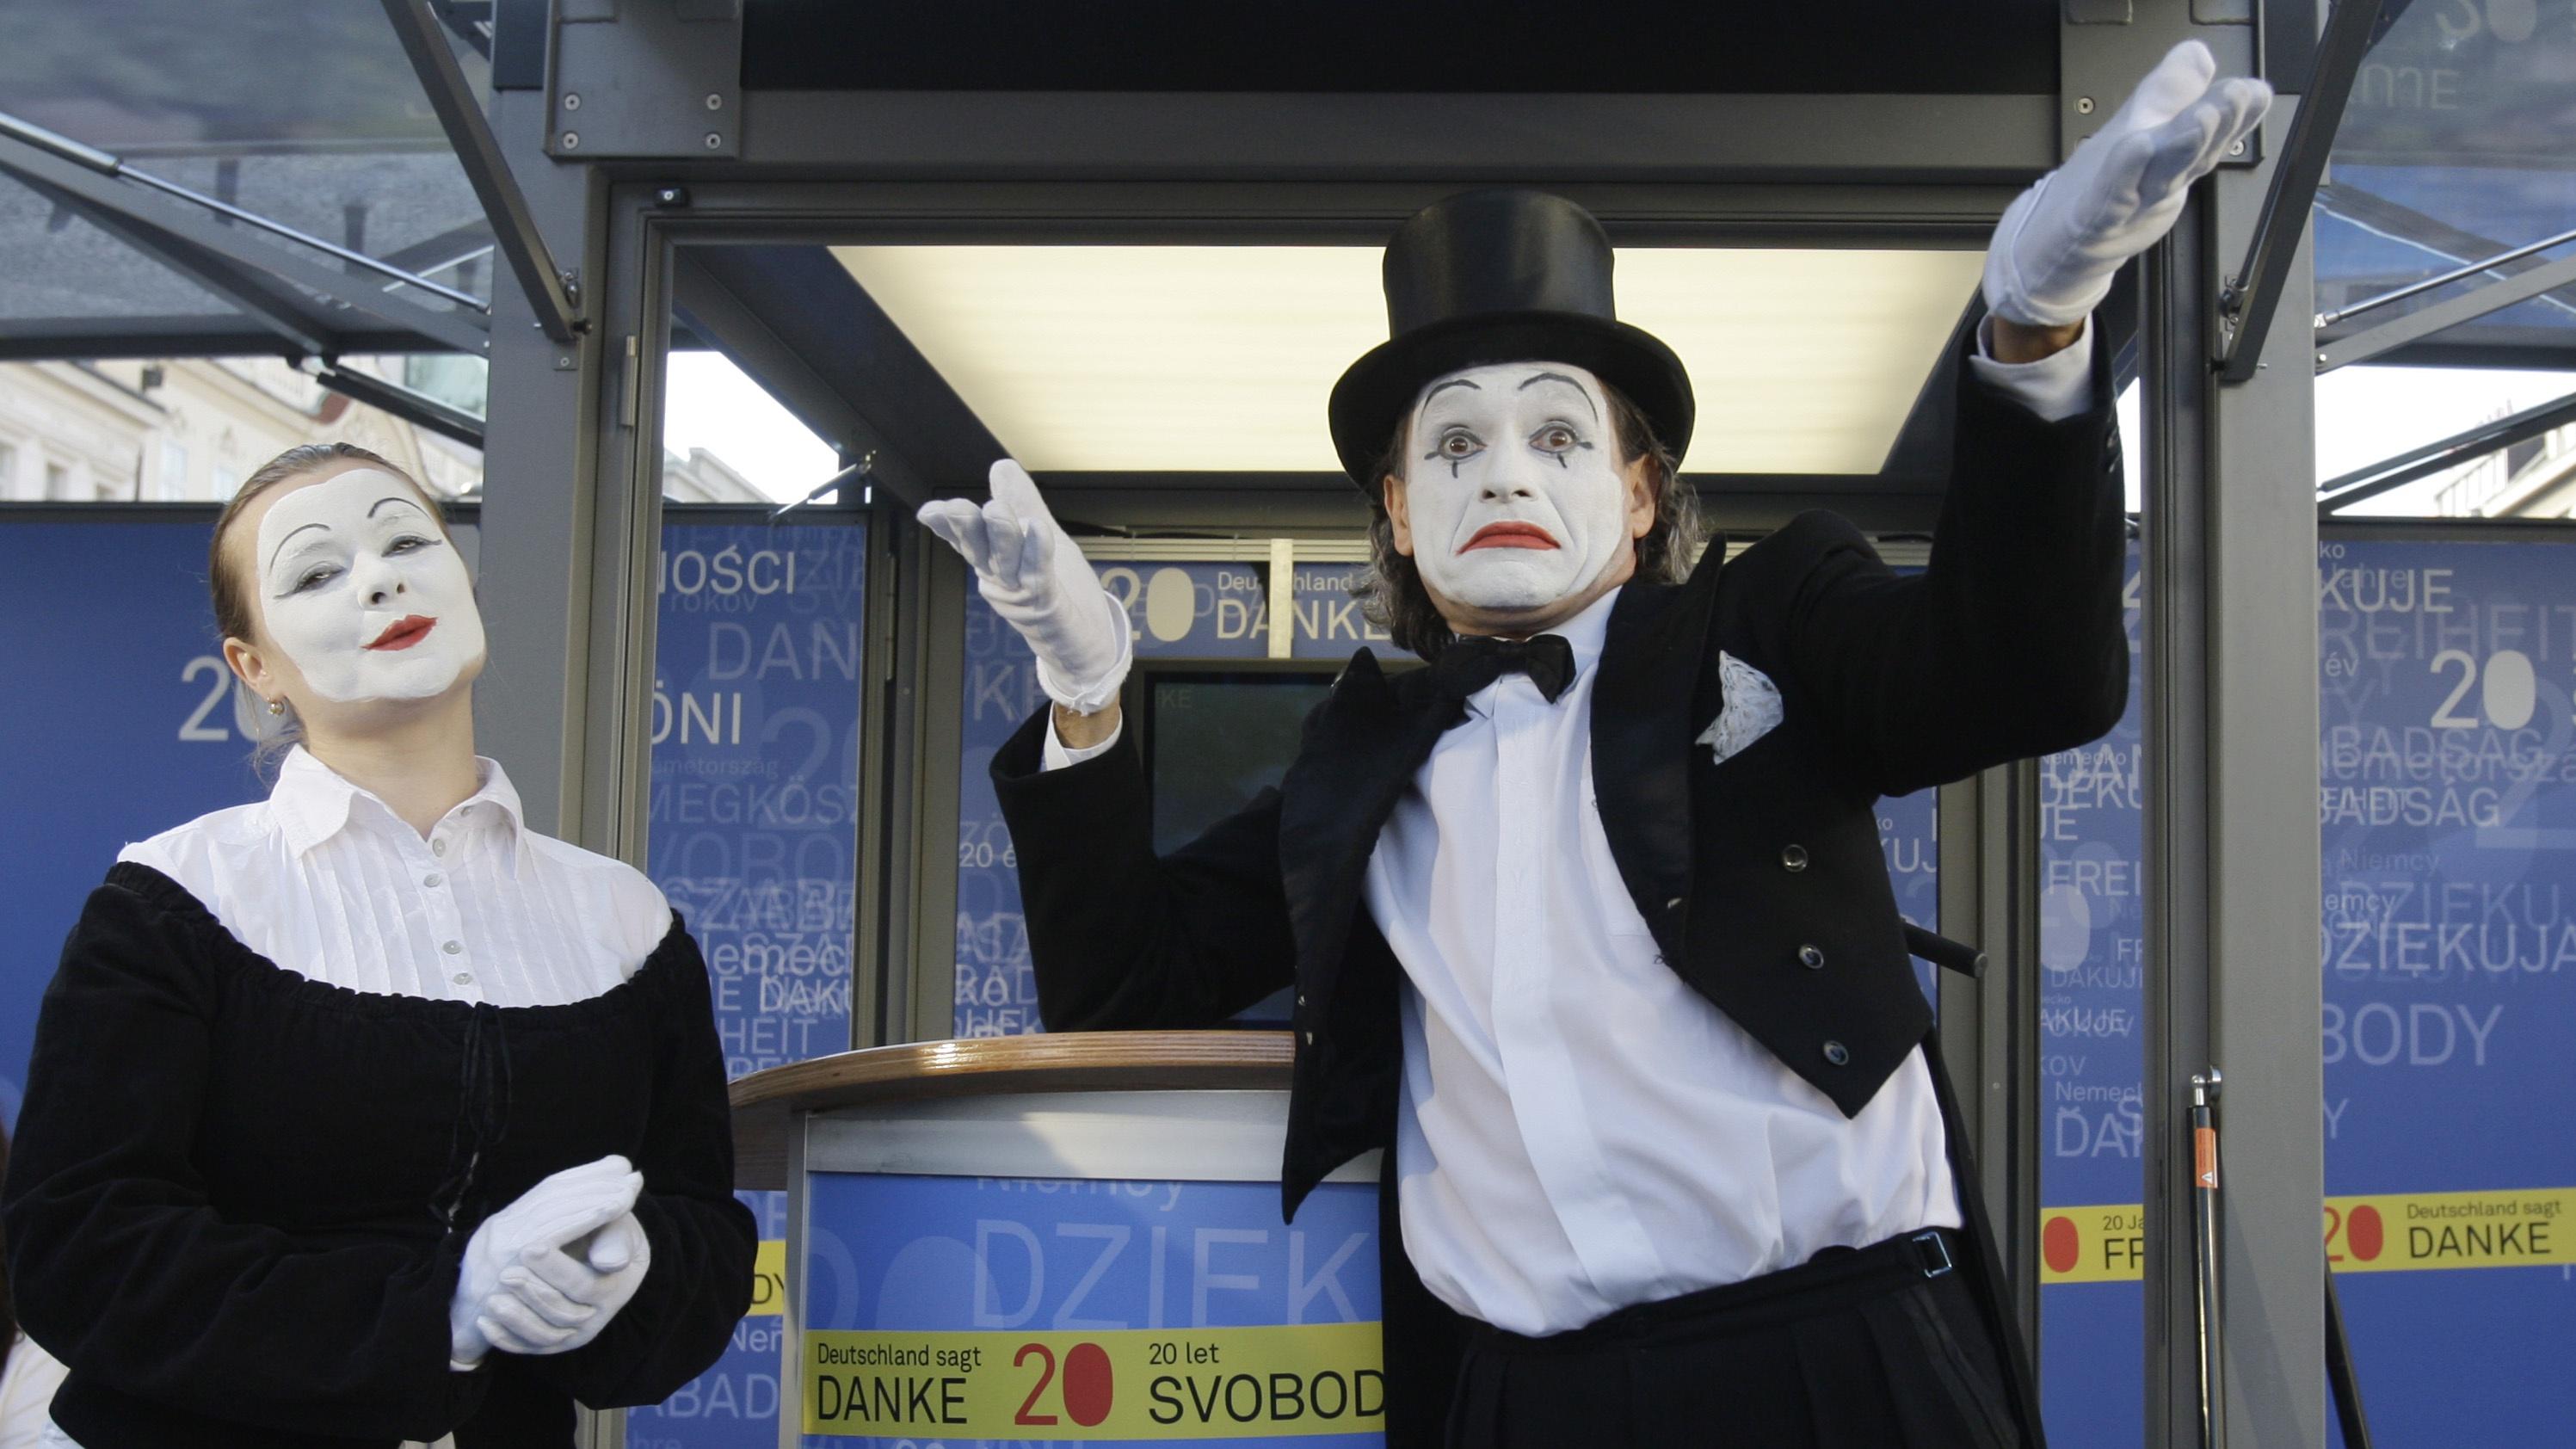 Mimes in Prague, Czech Republic